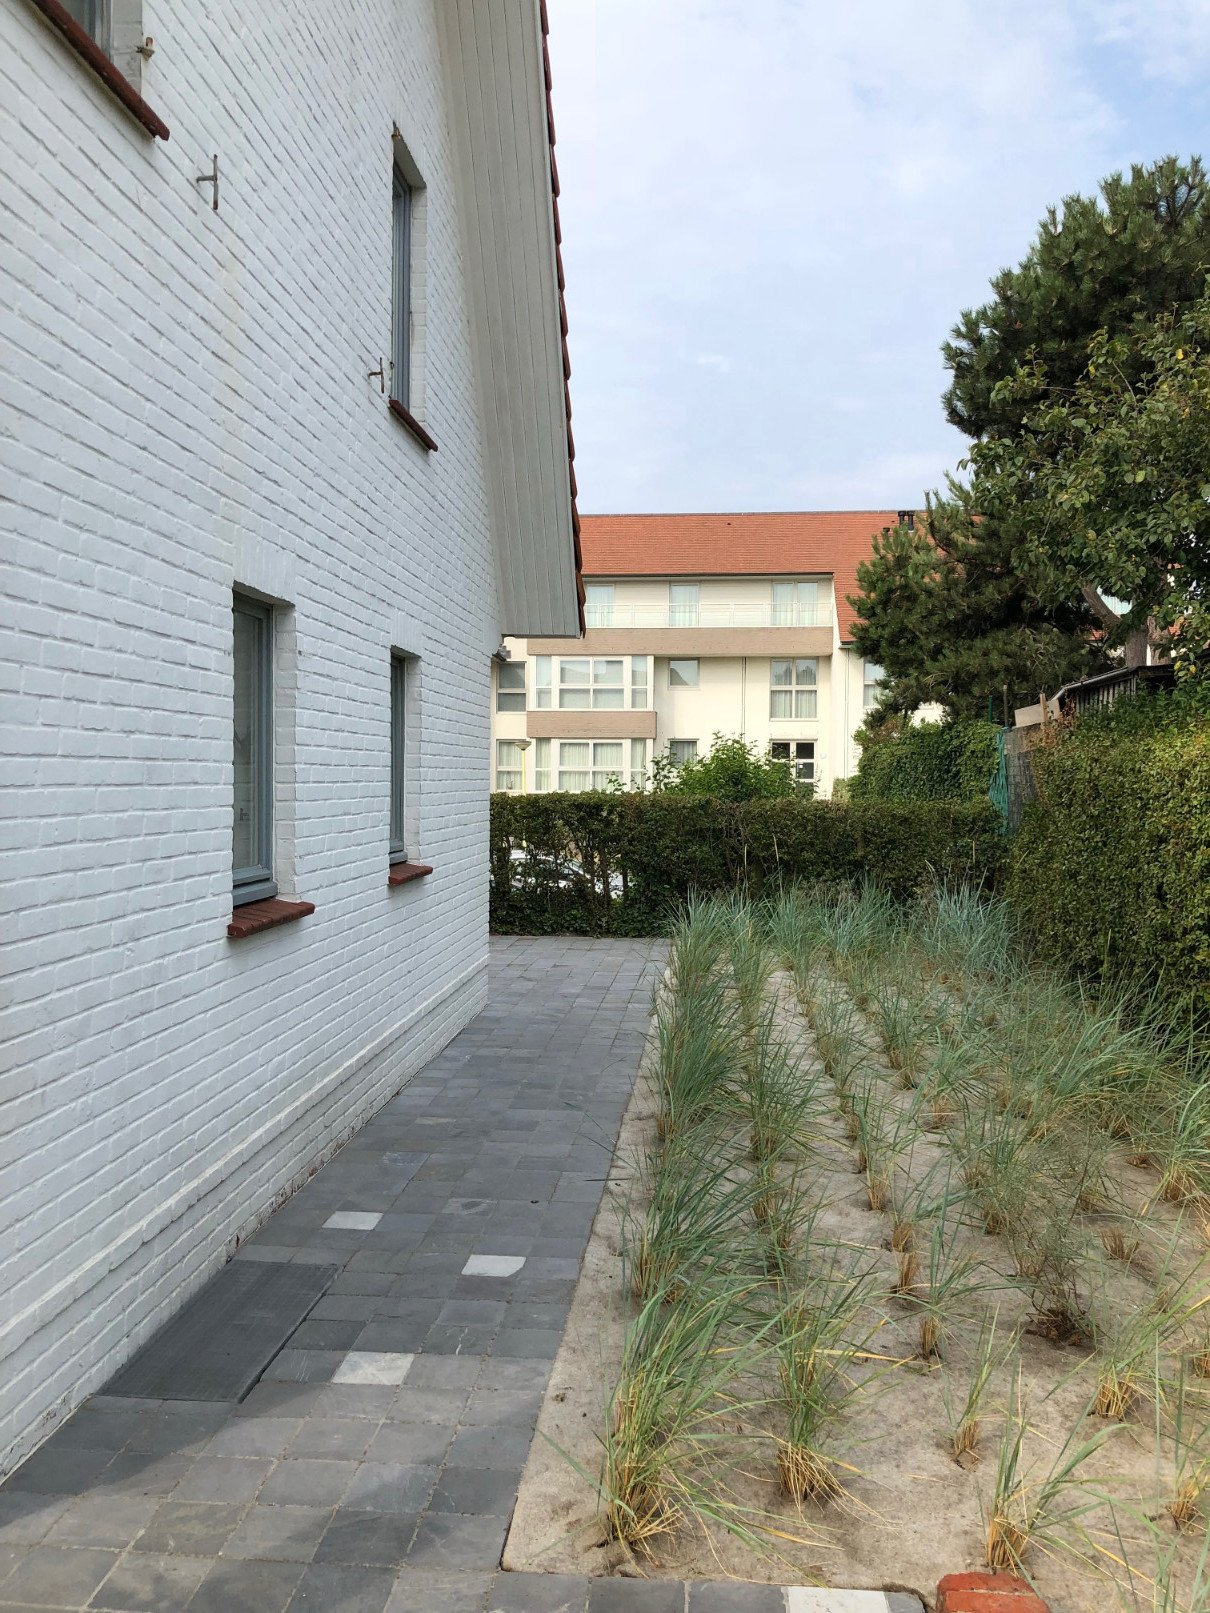 Rietveldprojects-Villa Were Di - Te Koop : Te Huur (per week)25